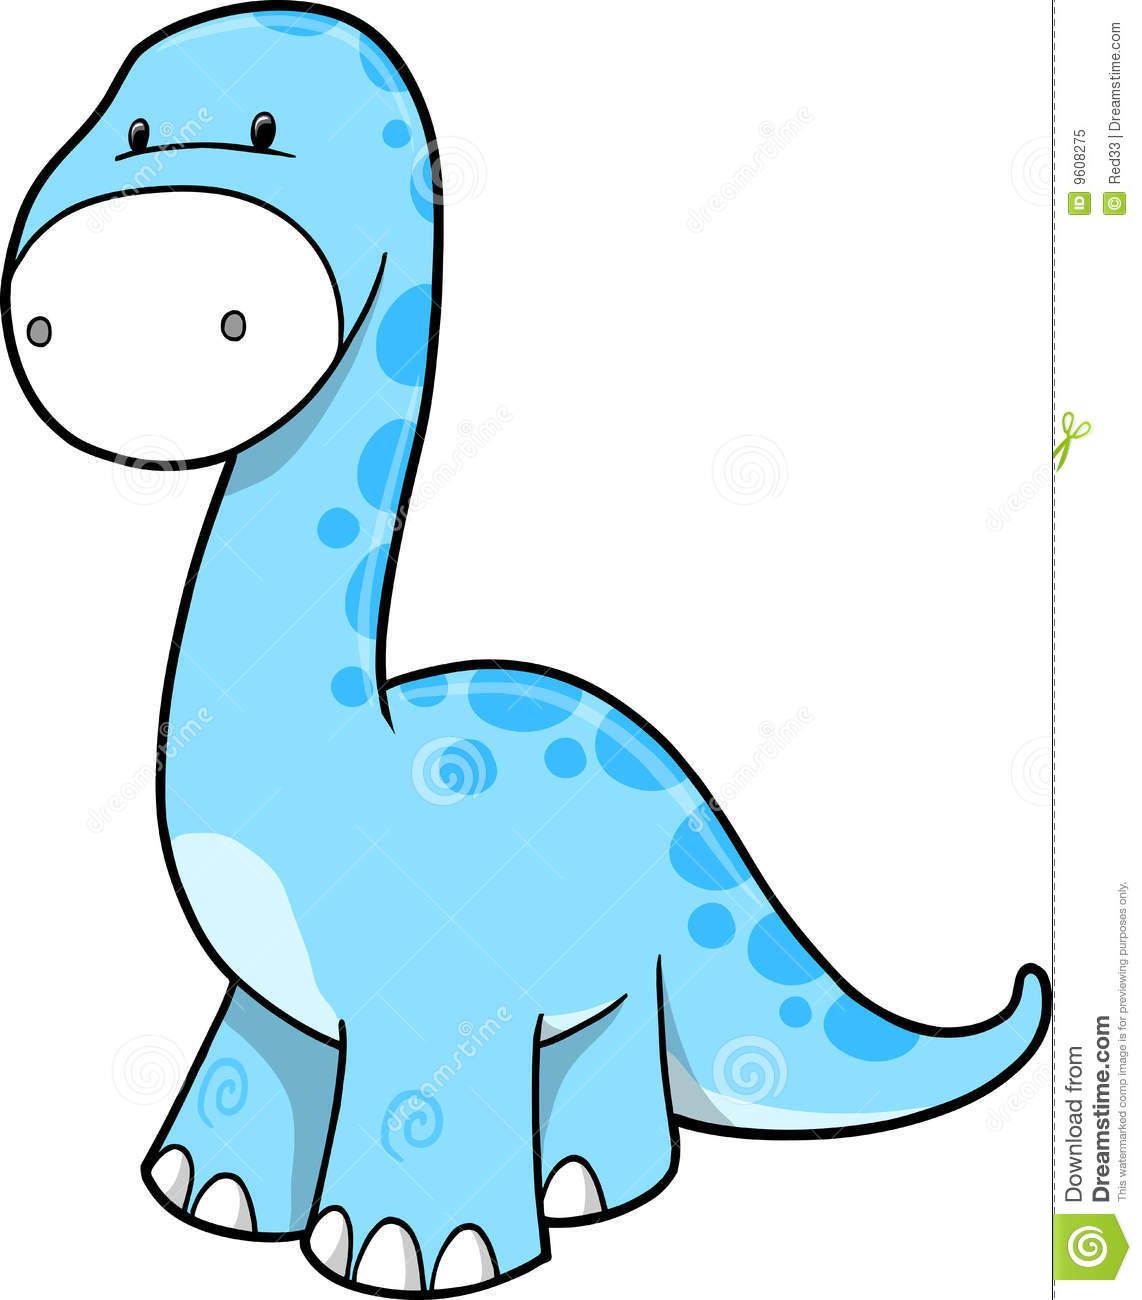 1142x1300 Dinosaur clipart blue